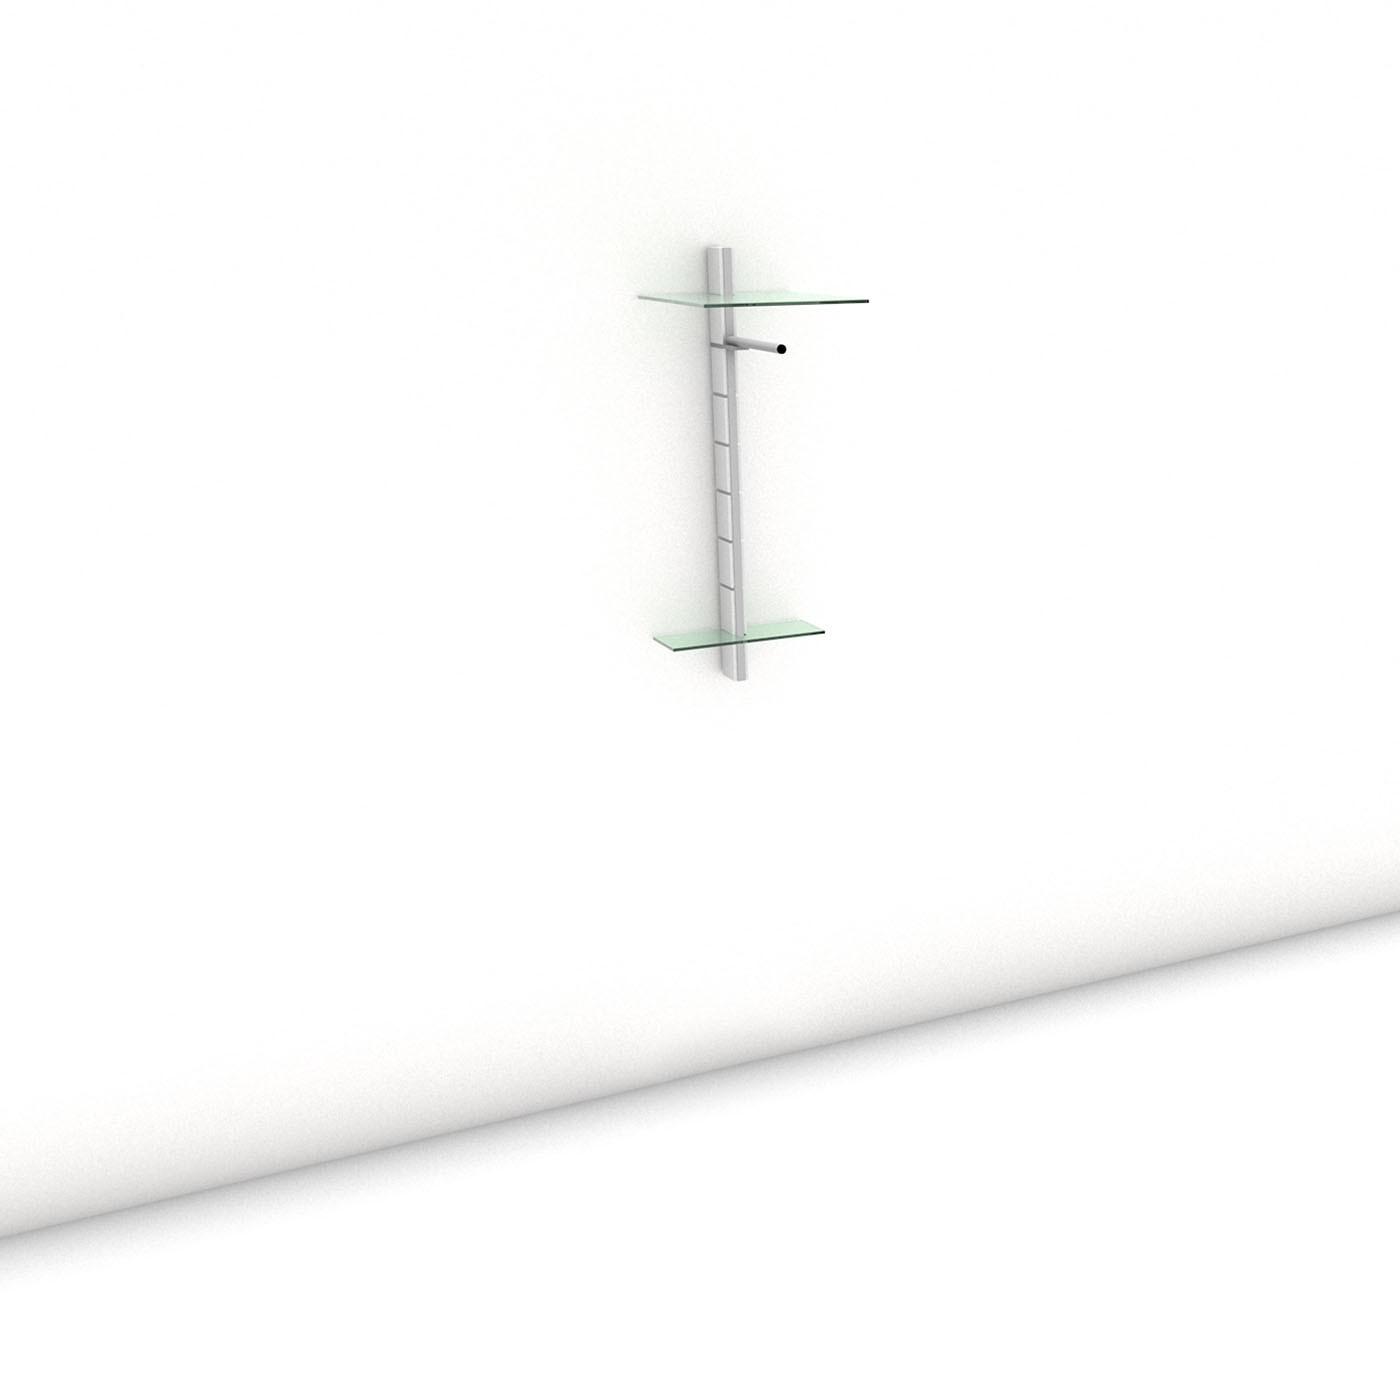 Garderobe - COAT-RACK - Slim (M) 40 - Maß: 40 x 107,2 x 45 cm (B x H x T)